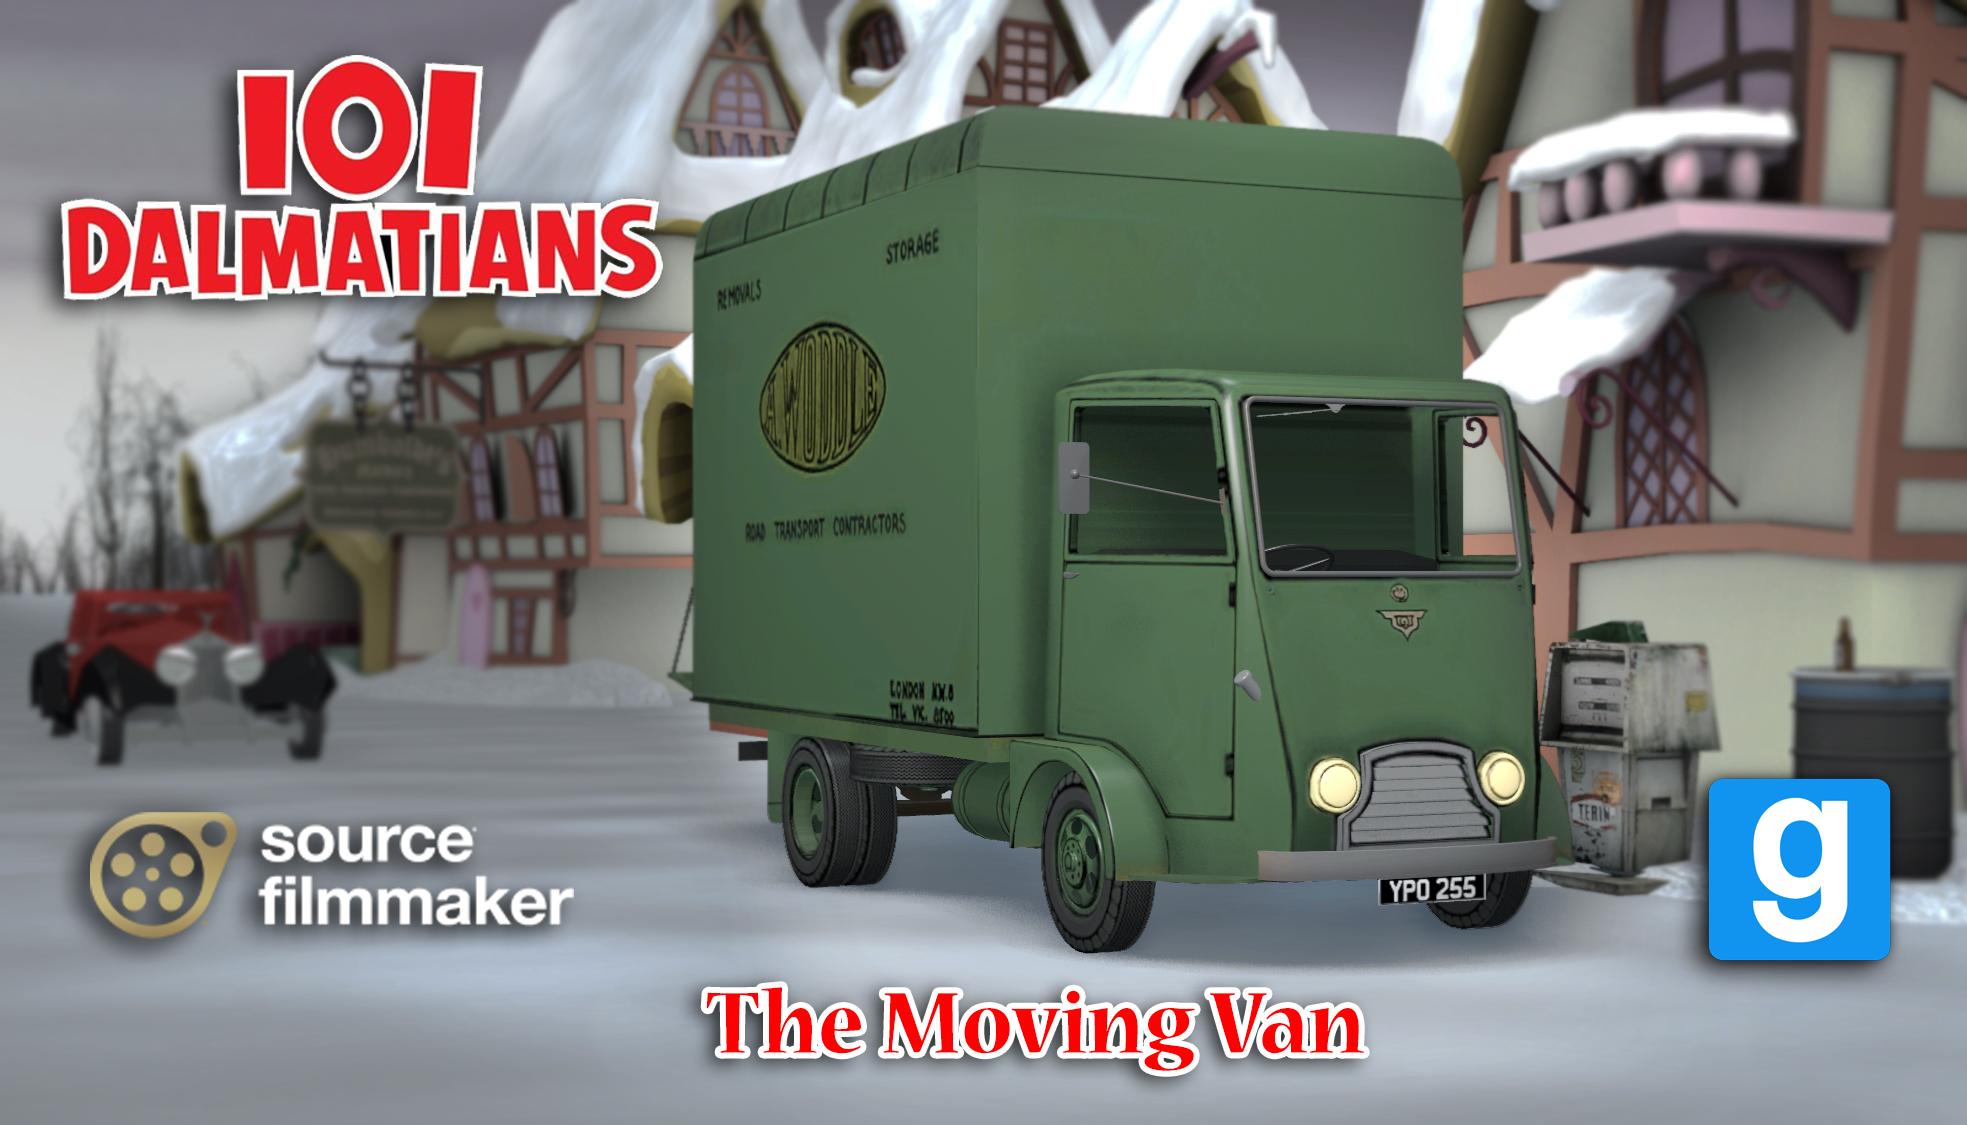 SFM/GMOD Model] The Moving Van by YanPictures on DeviantArt